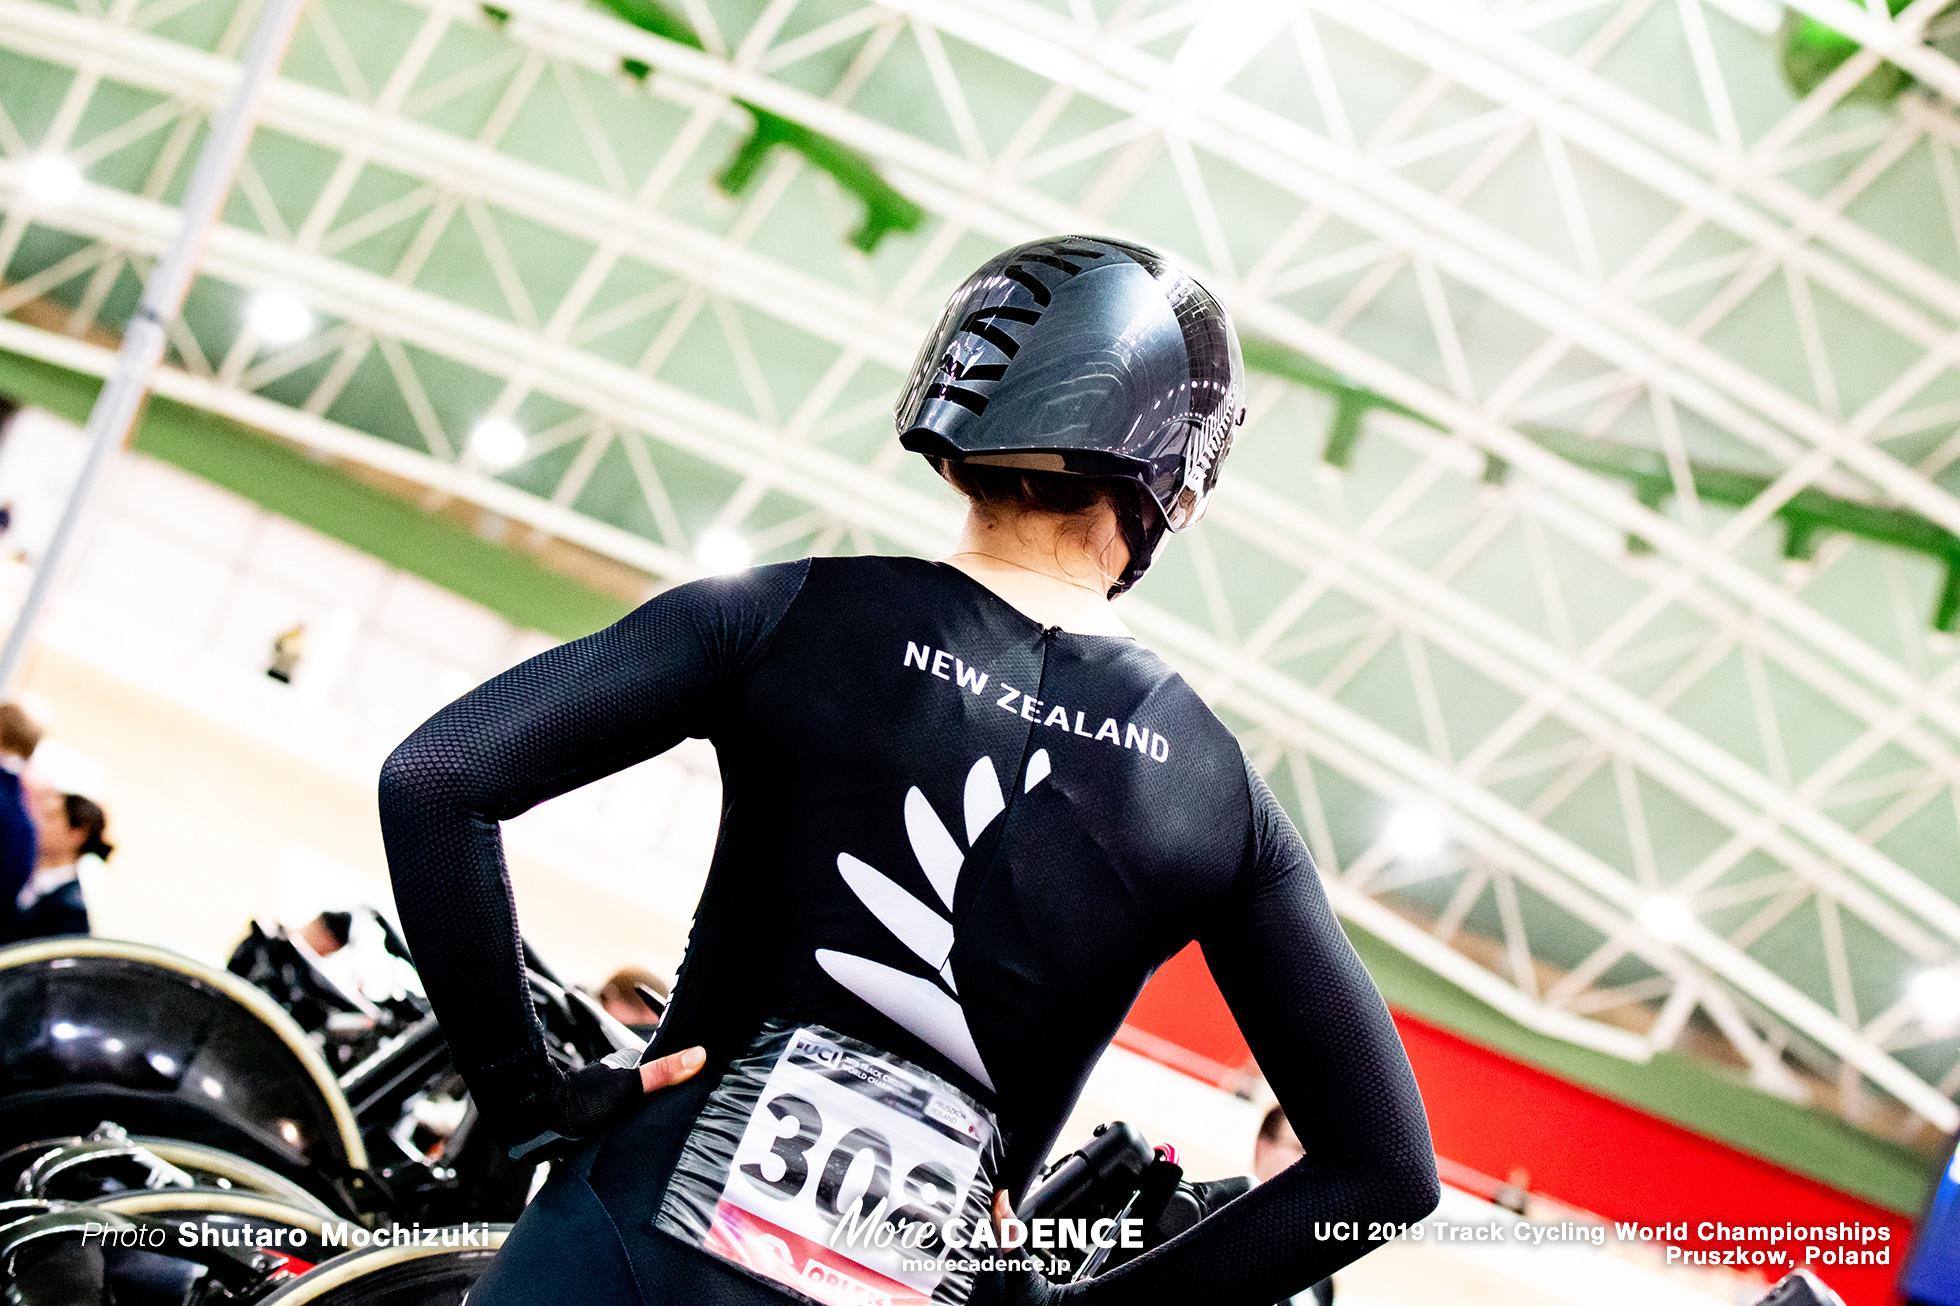 Men's Team Pursuit / 2019 Track Cycling World Championships Pruszków, Poland